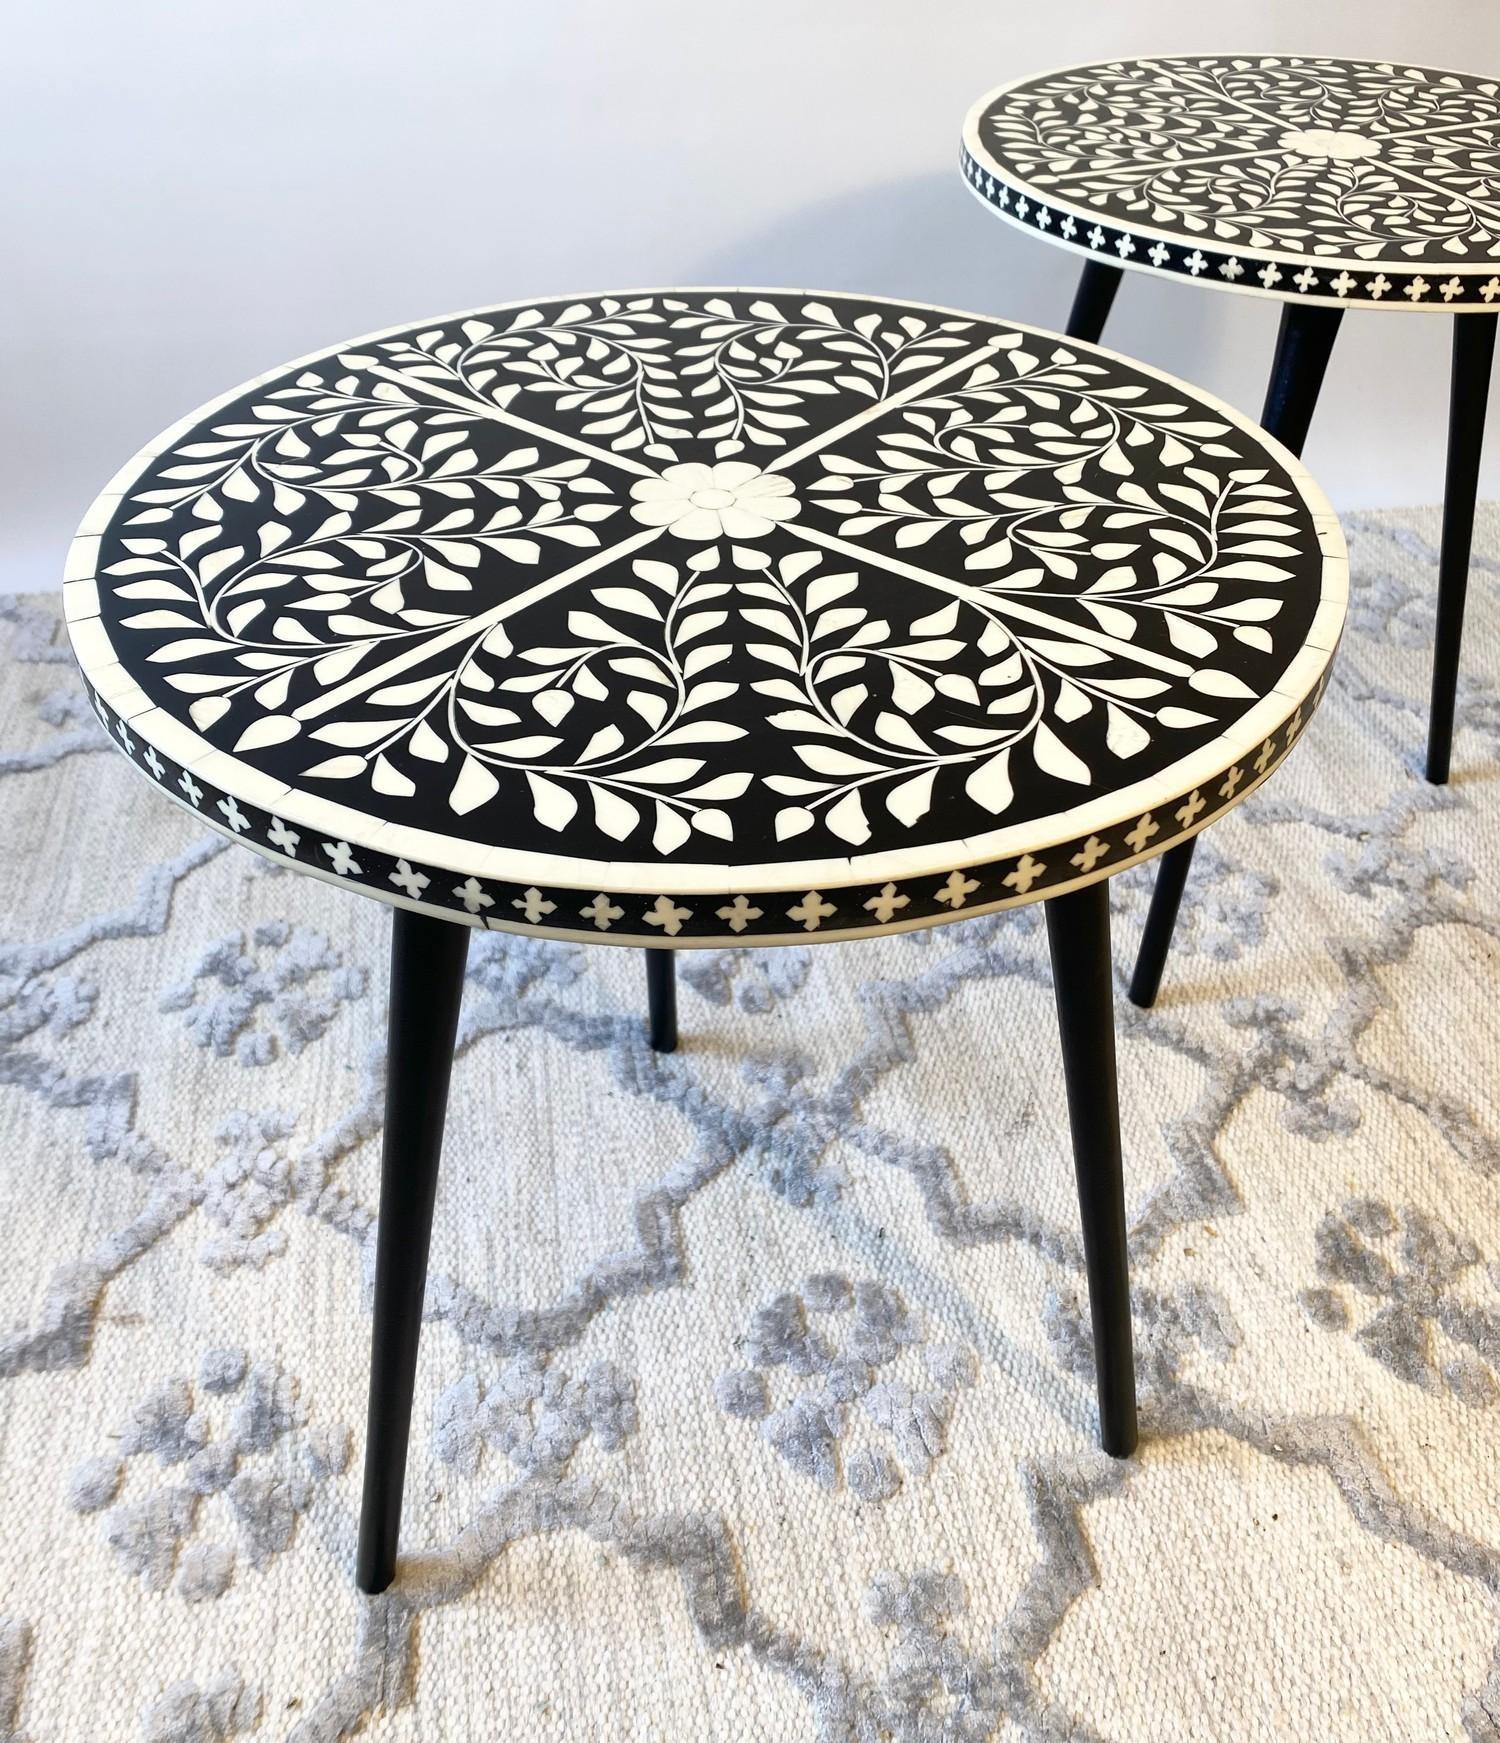 LAMP TABLES, a pair, Moorish design inlaid tops on tripod metal legs, 47cm H x 41cm x 41cm. (2) - Image 2 of 5